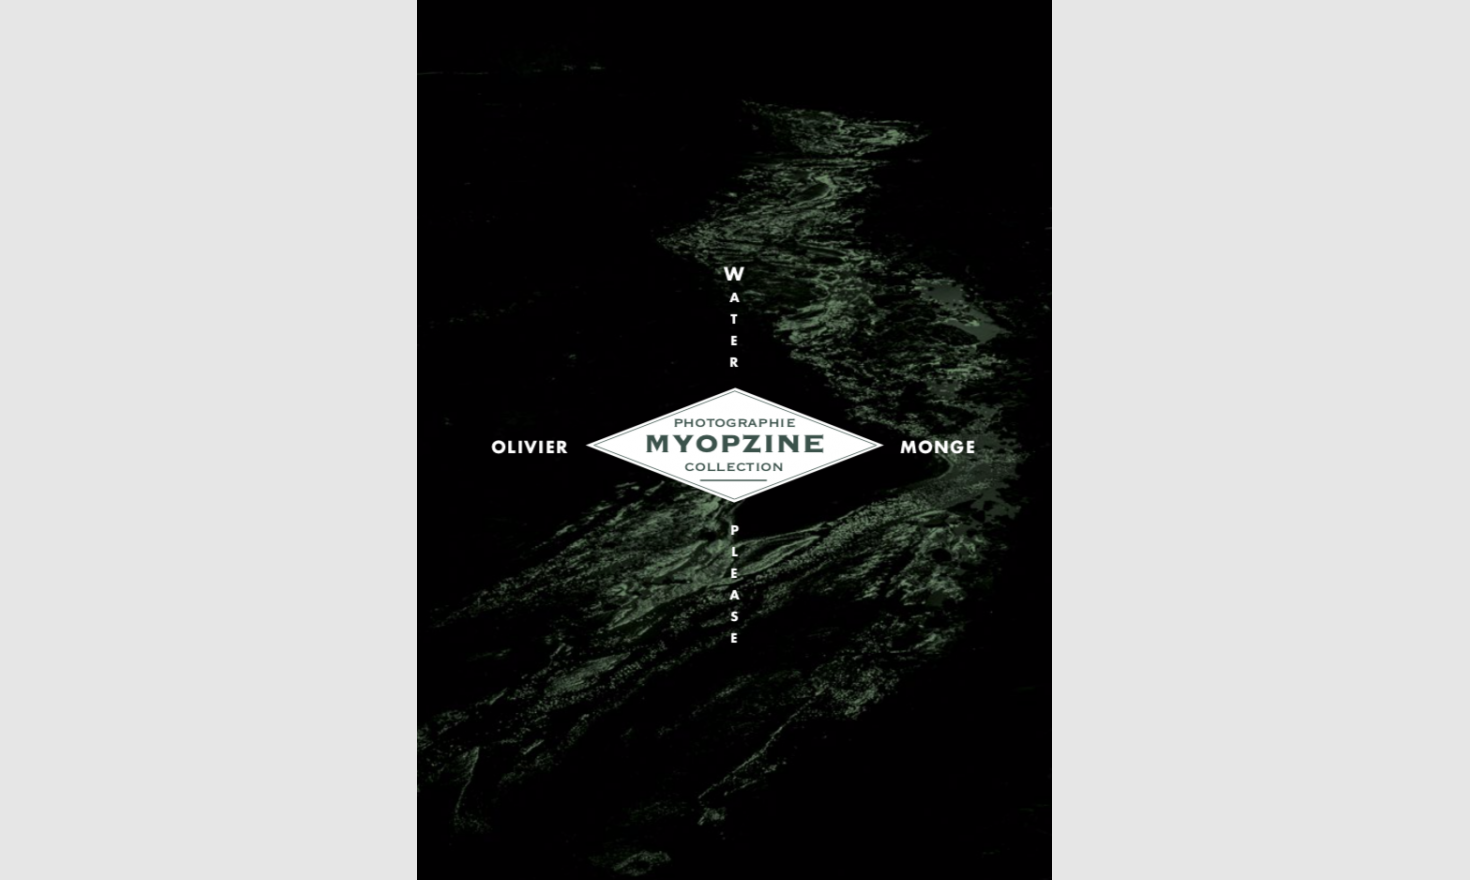 MYOPzine